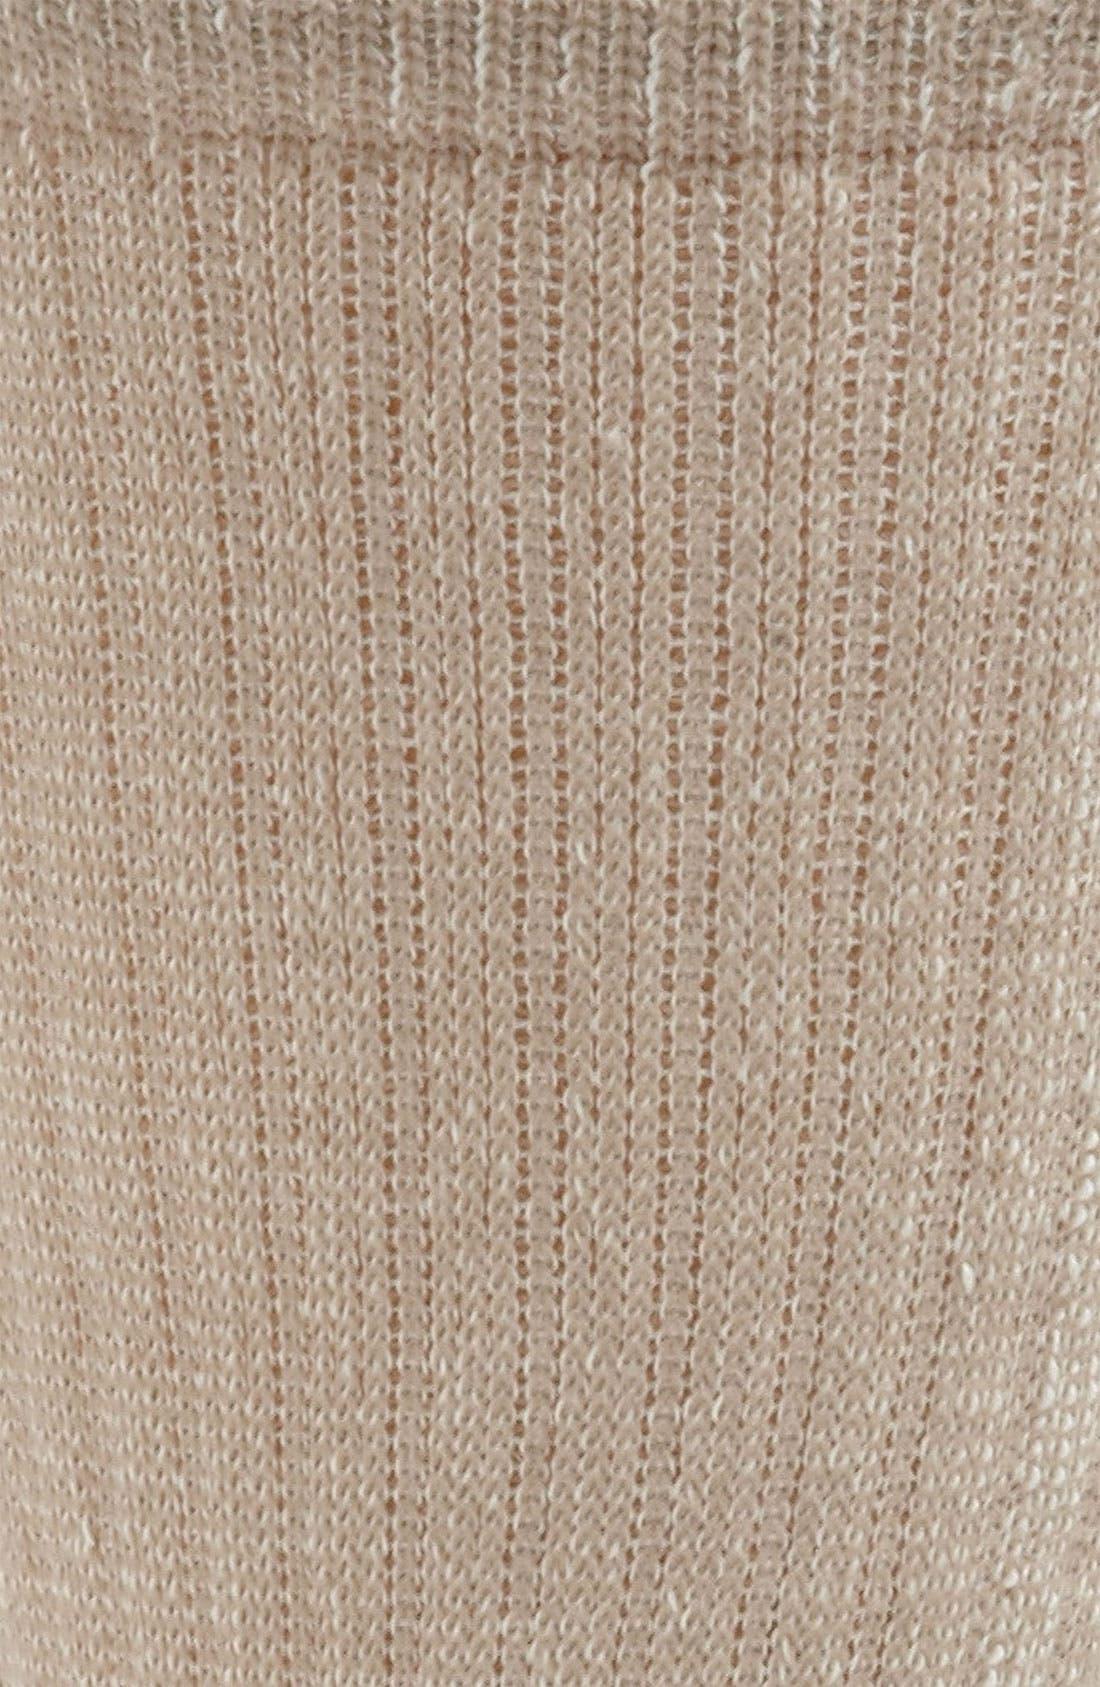 Alternate Image 2  - Timberland Lightweight Merino Wool Blend Crew Socks (2-Pack)